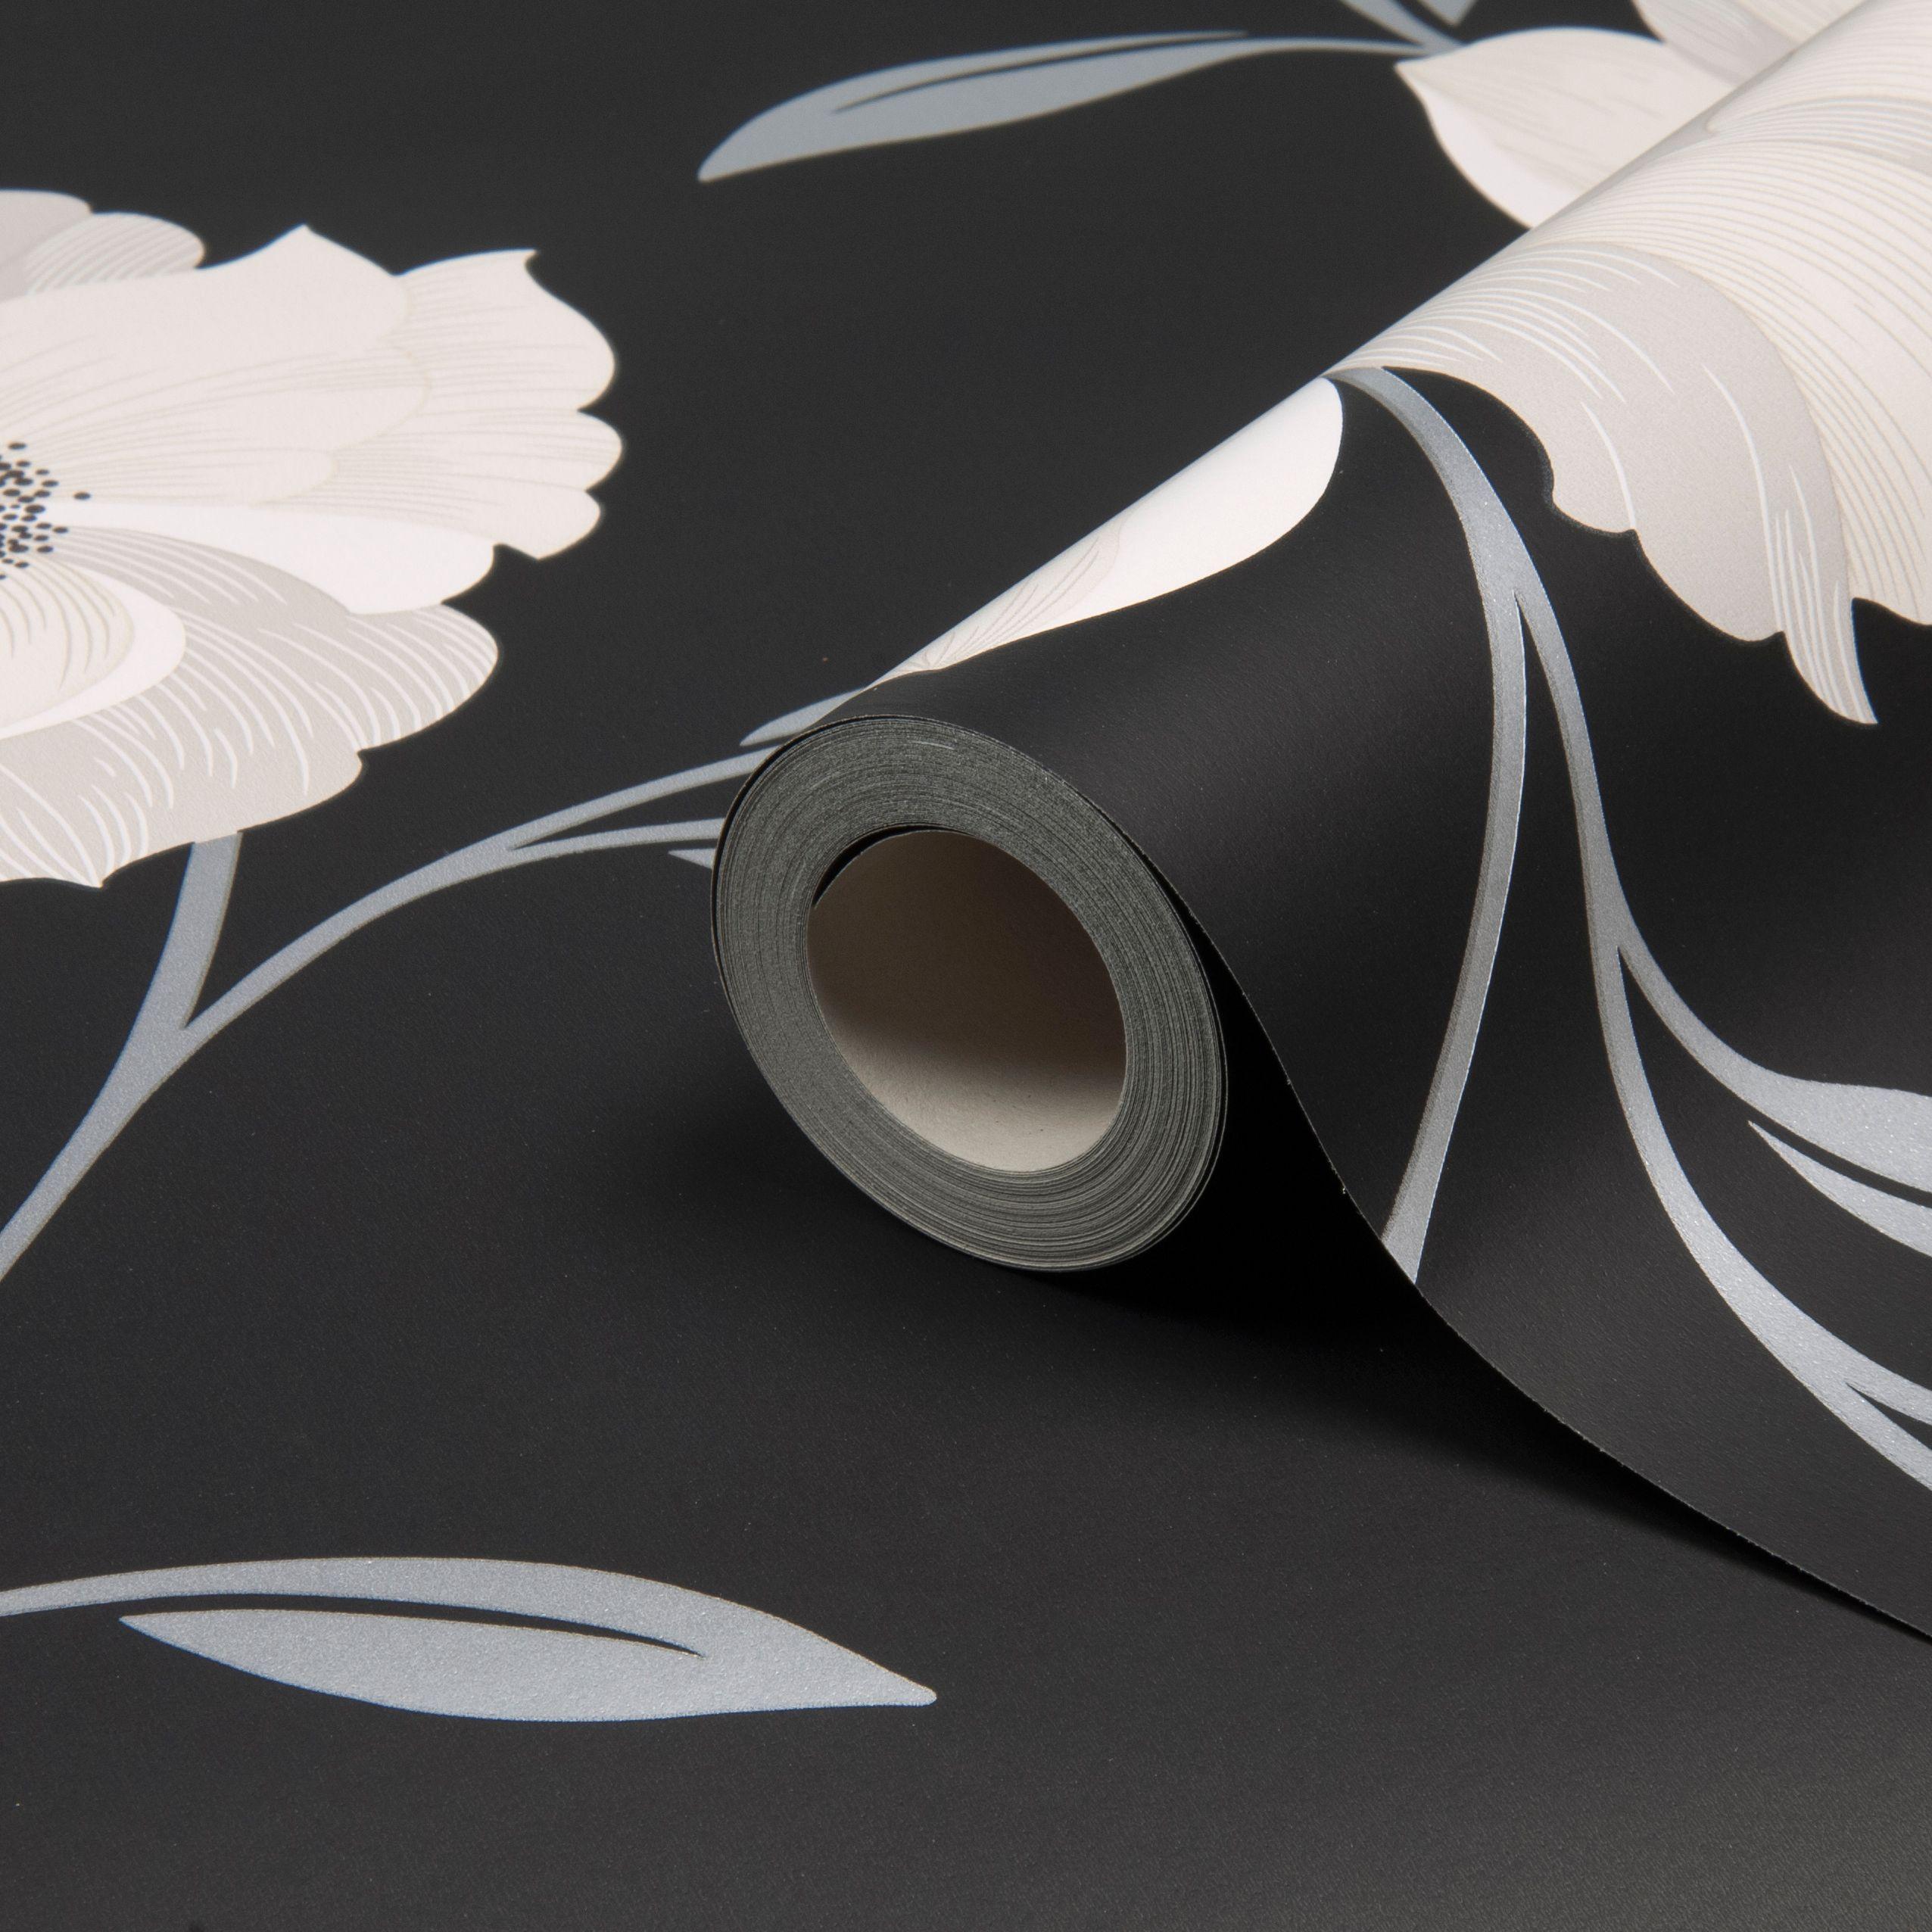 Charleston Floral Black White Wallpaper Departments Diy At B Q Floral Wallpaper Black And White Wallpaper White Wallpaper